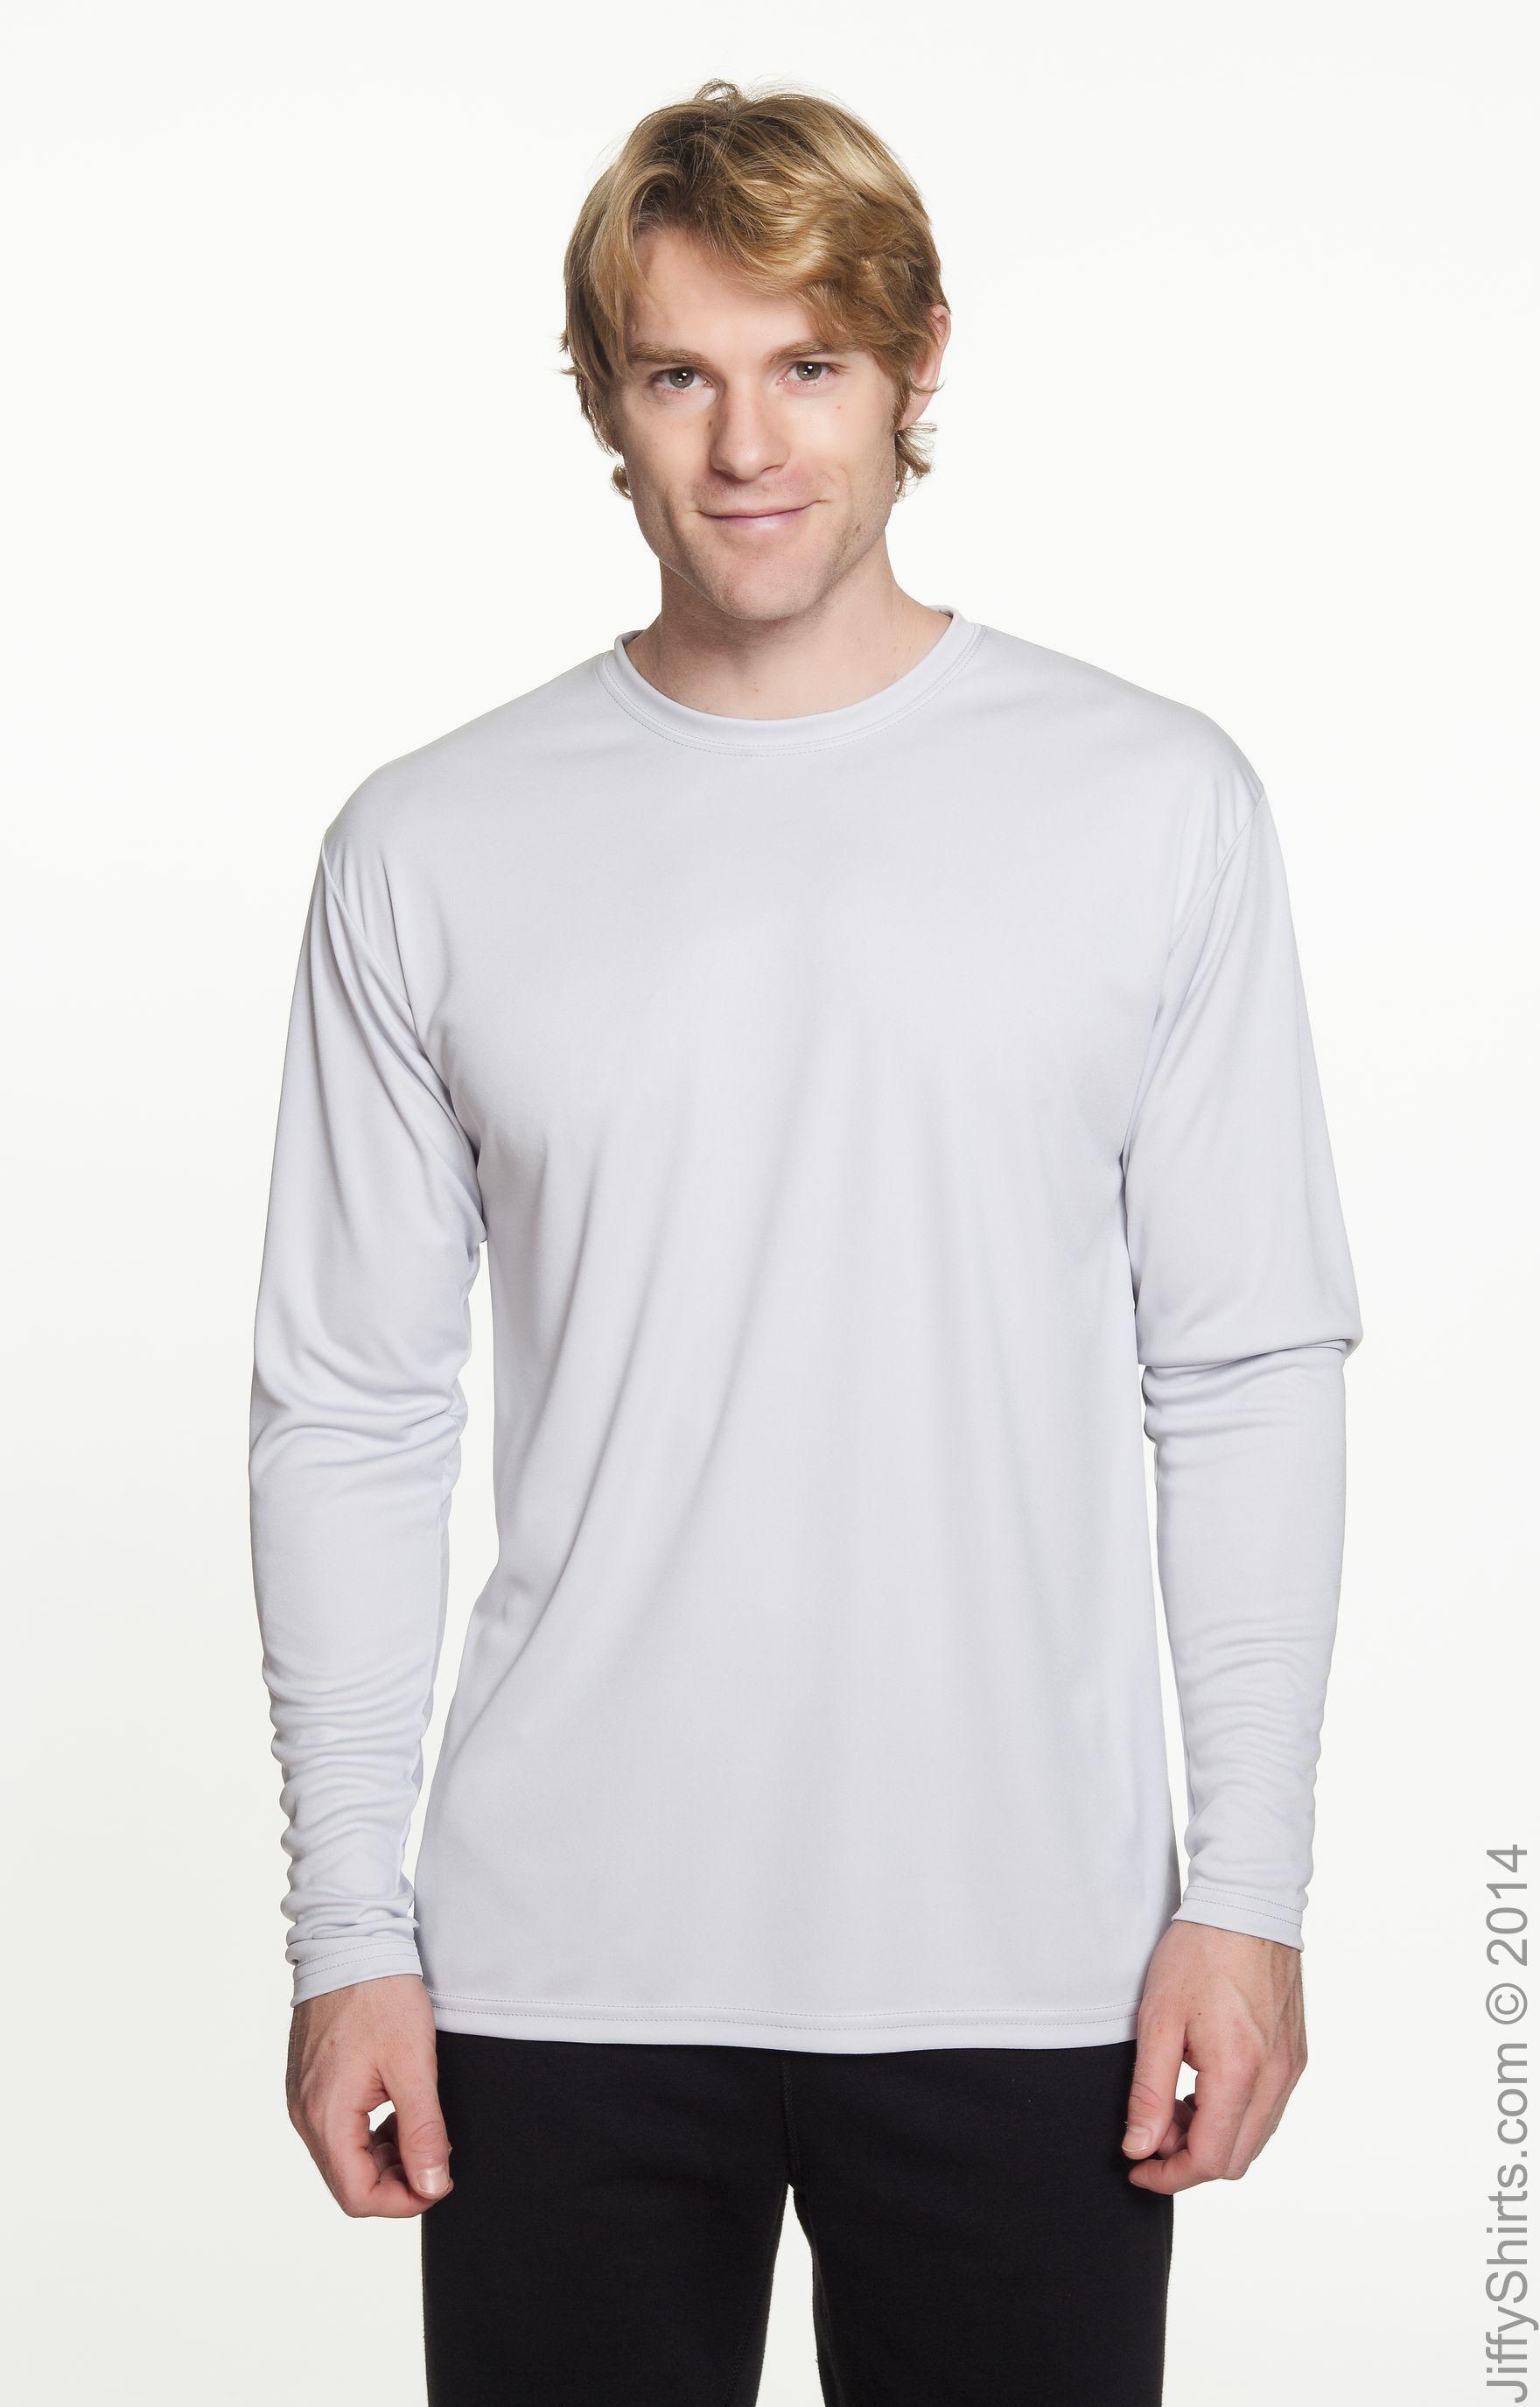 Men/'s SPORT TEK S-4XL Dri-Fit Performance Moisture Wicking Long Sleeve T-SHIRT